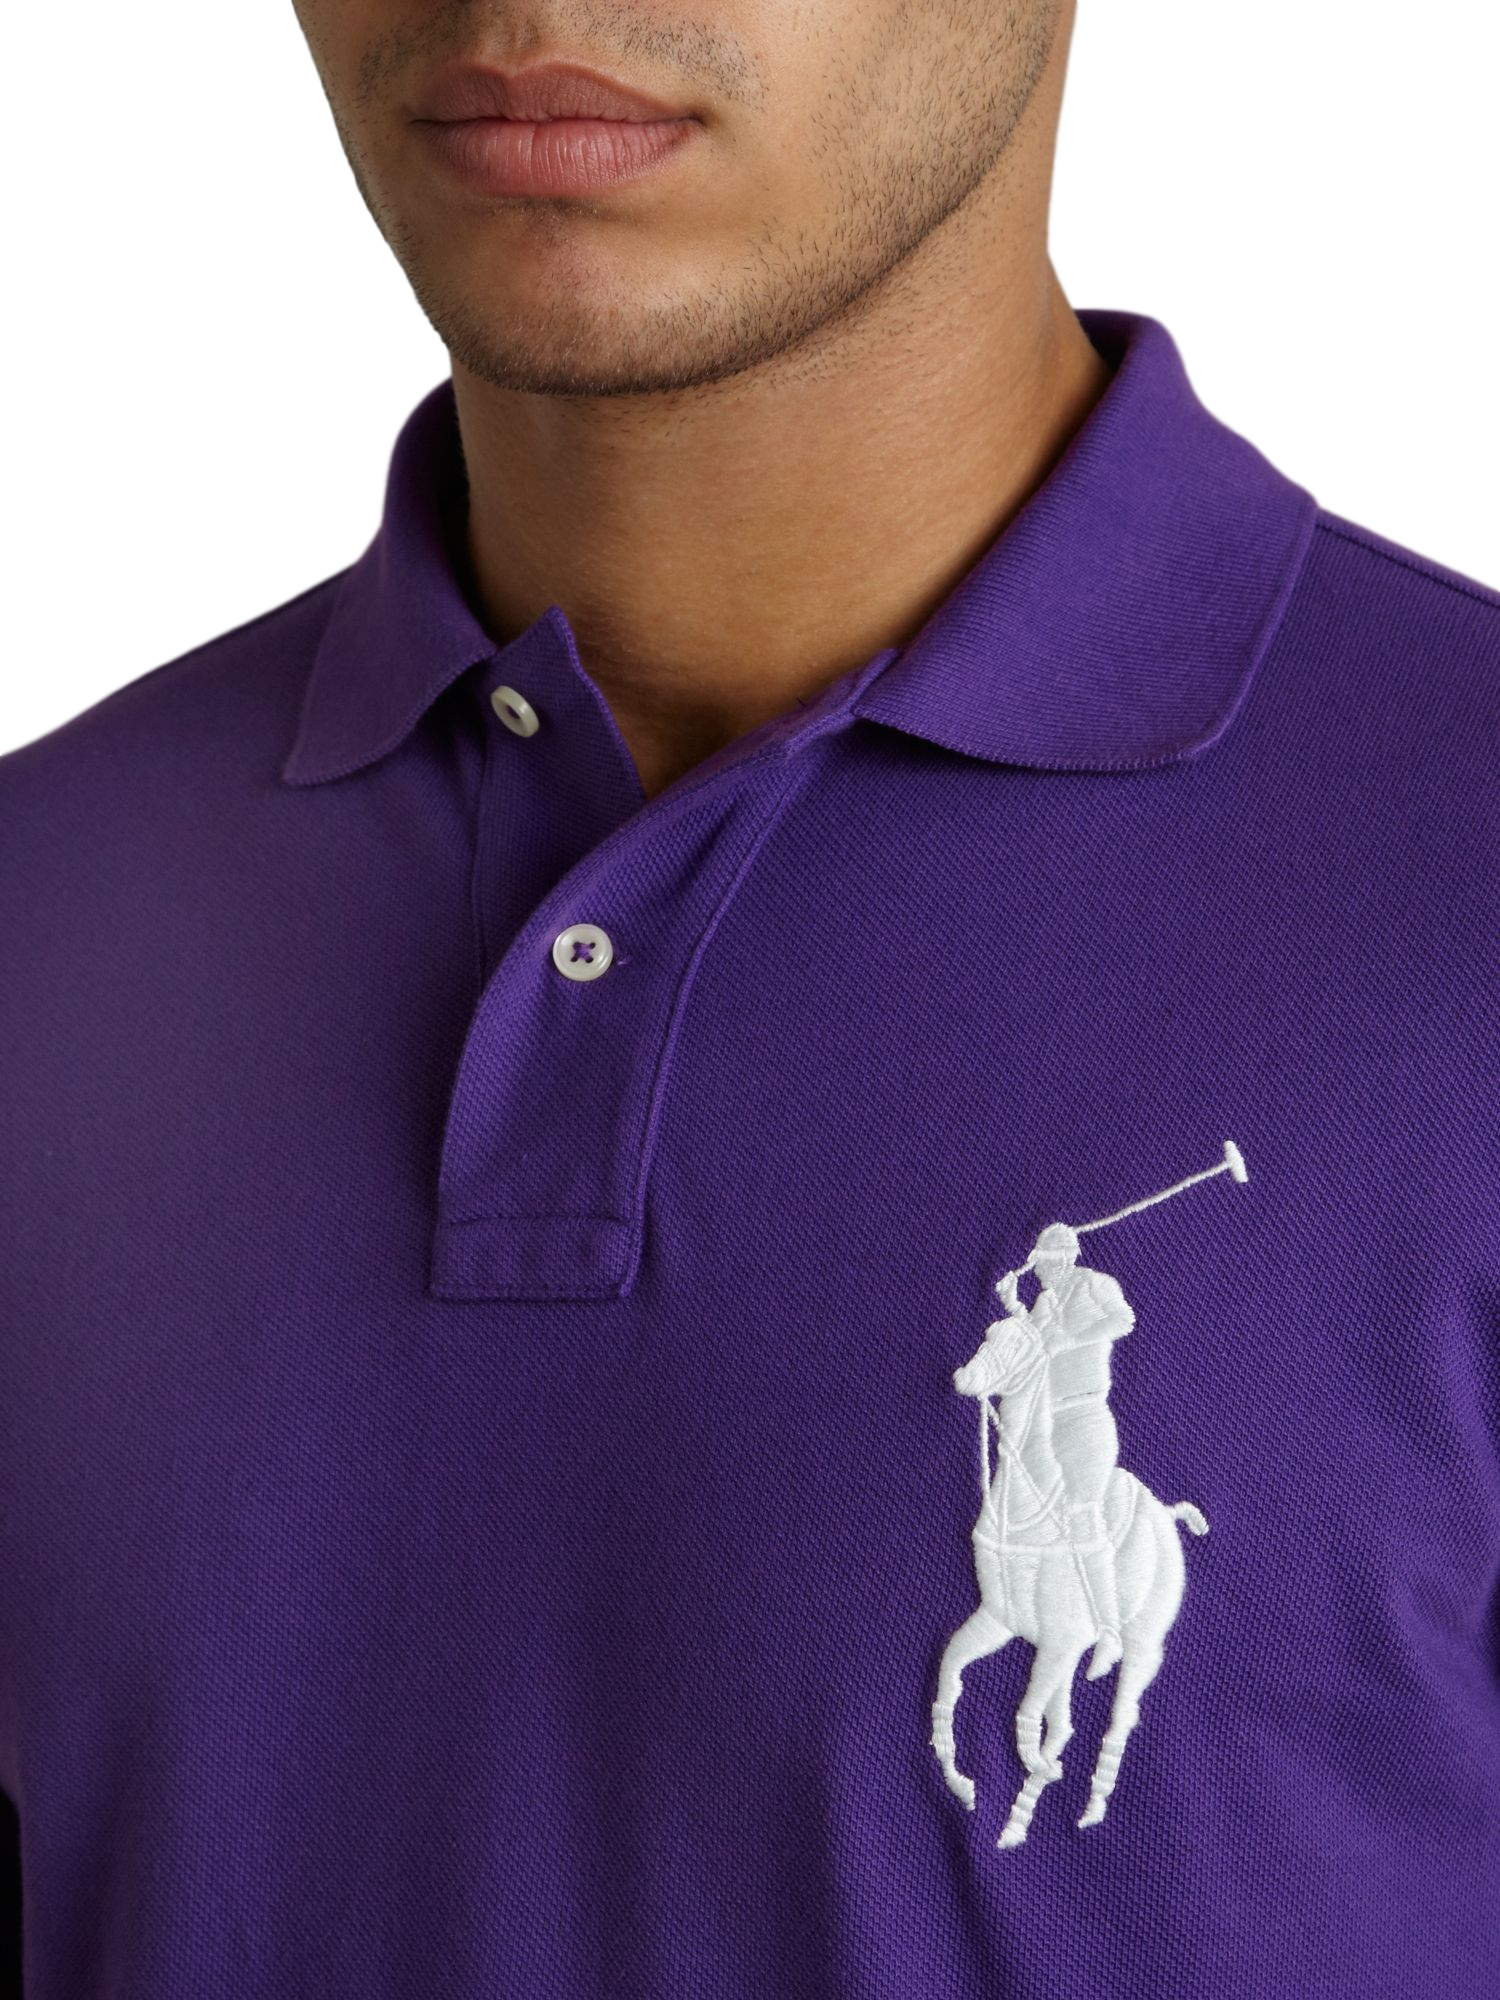 polo-ralph-lauren-purple-wimbledon-big-pony-mesh-polo-shirt-product-3-11632406-122946732_clipped_rev_1.png